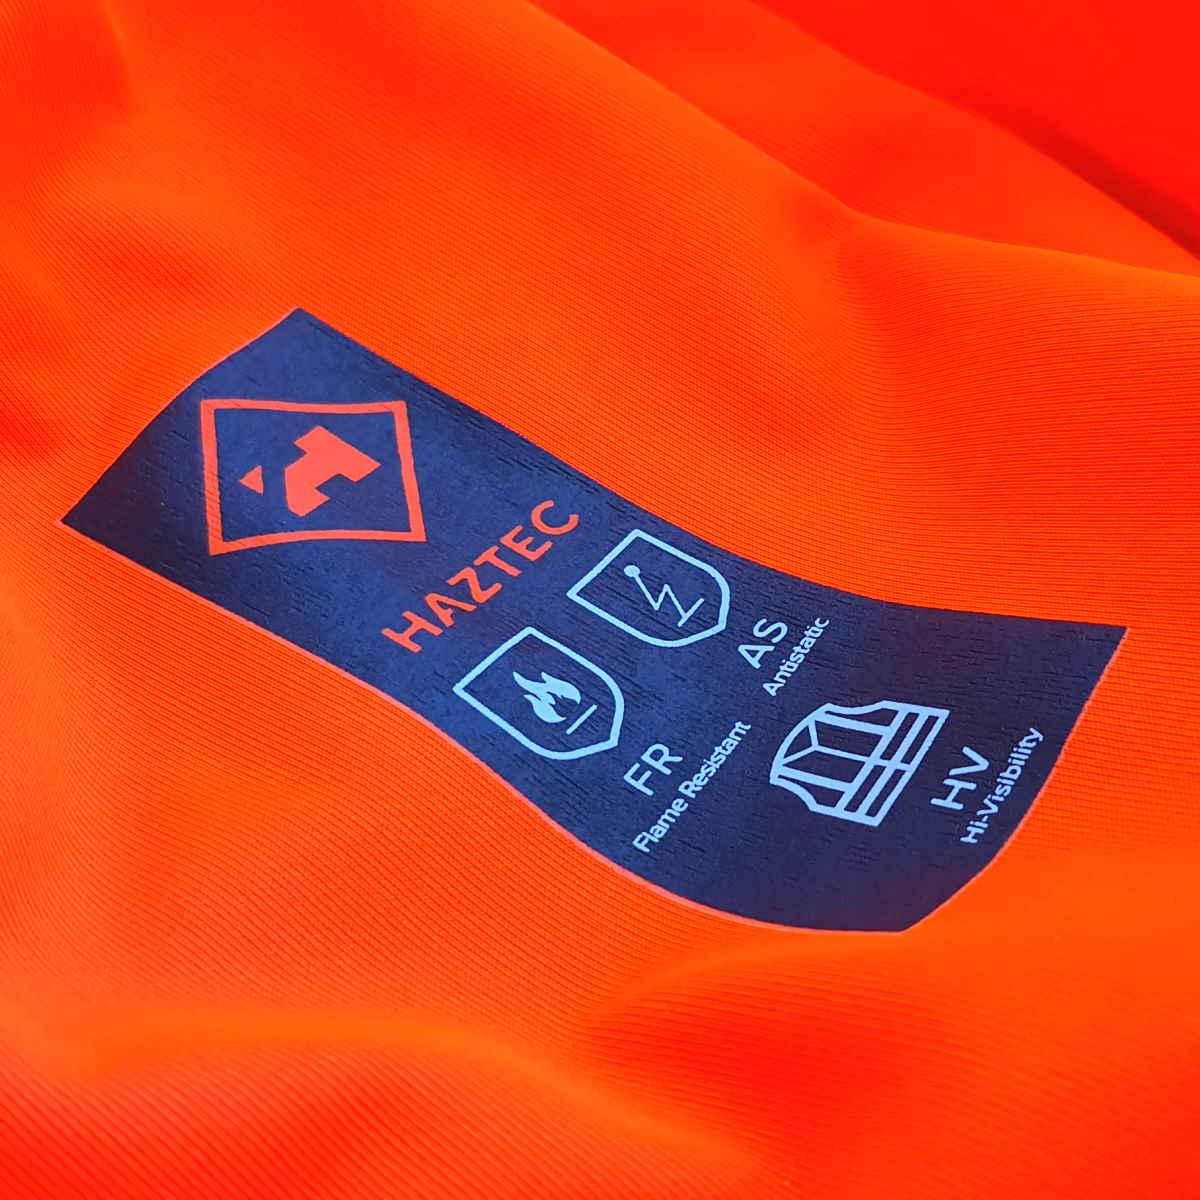 AS0059 HAZTEC® Cossack FR AS Hi-Vis Softshell Jacket_EN Icons